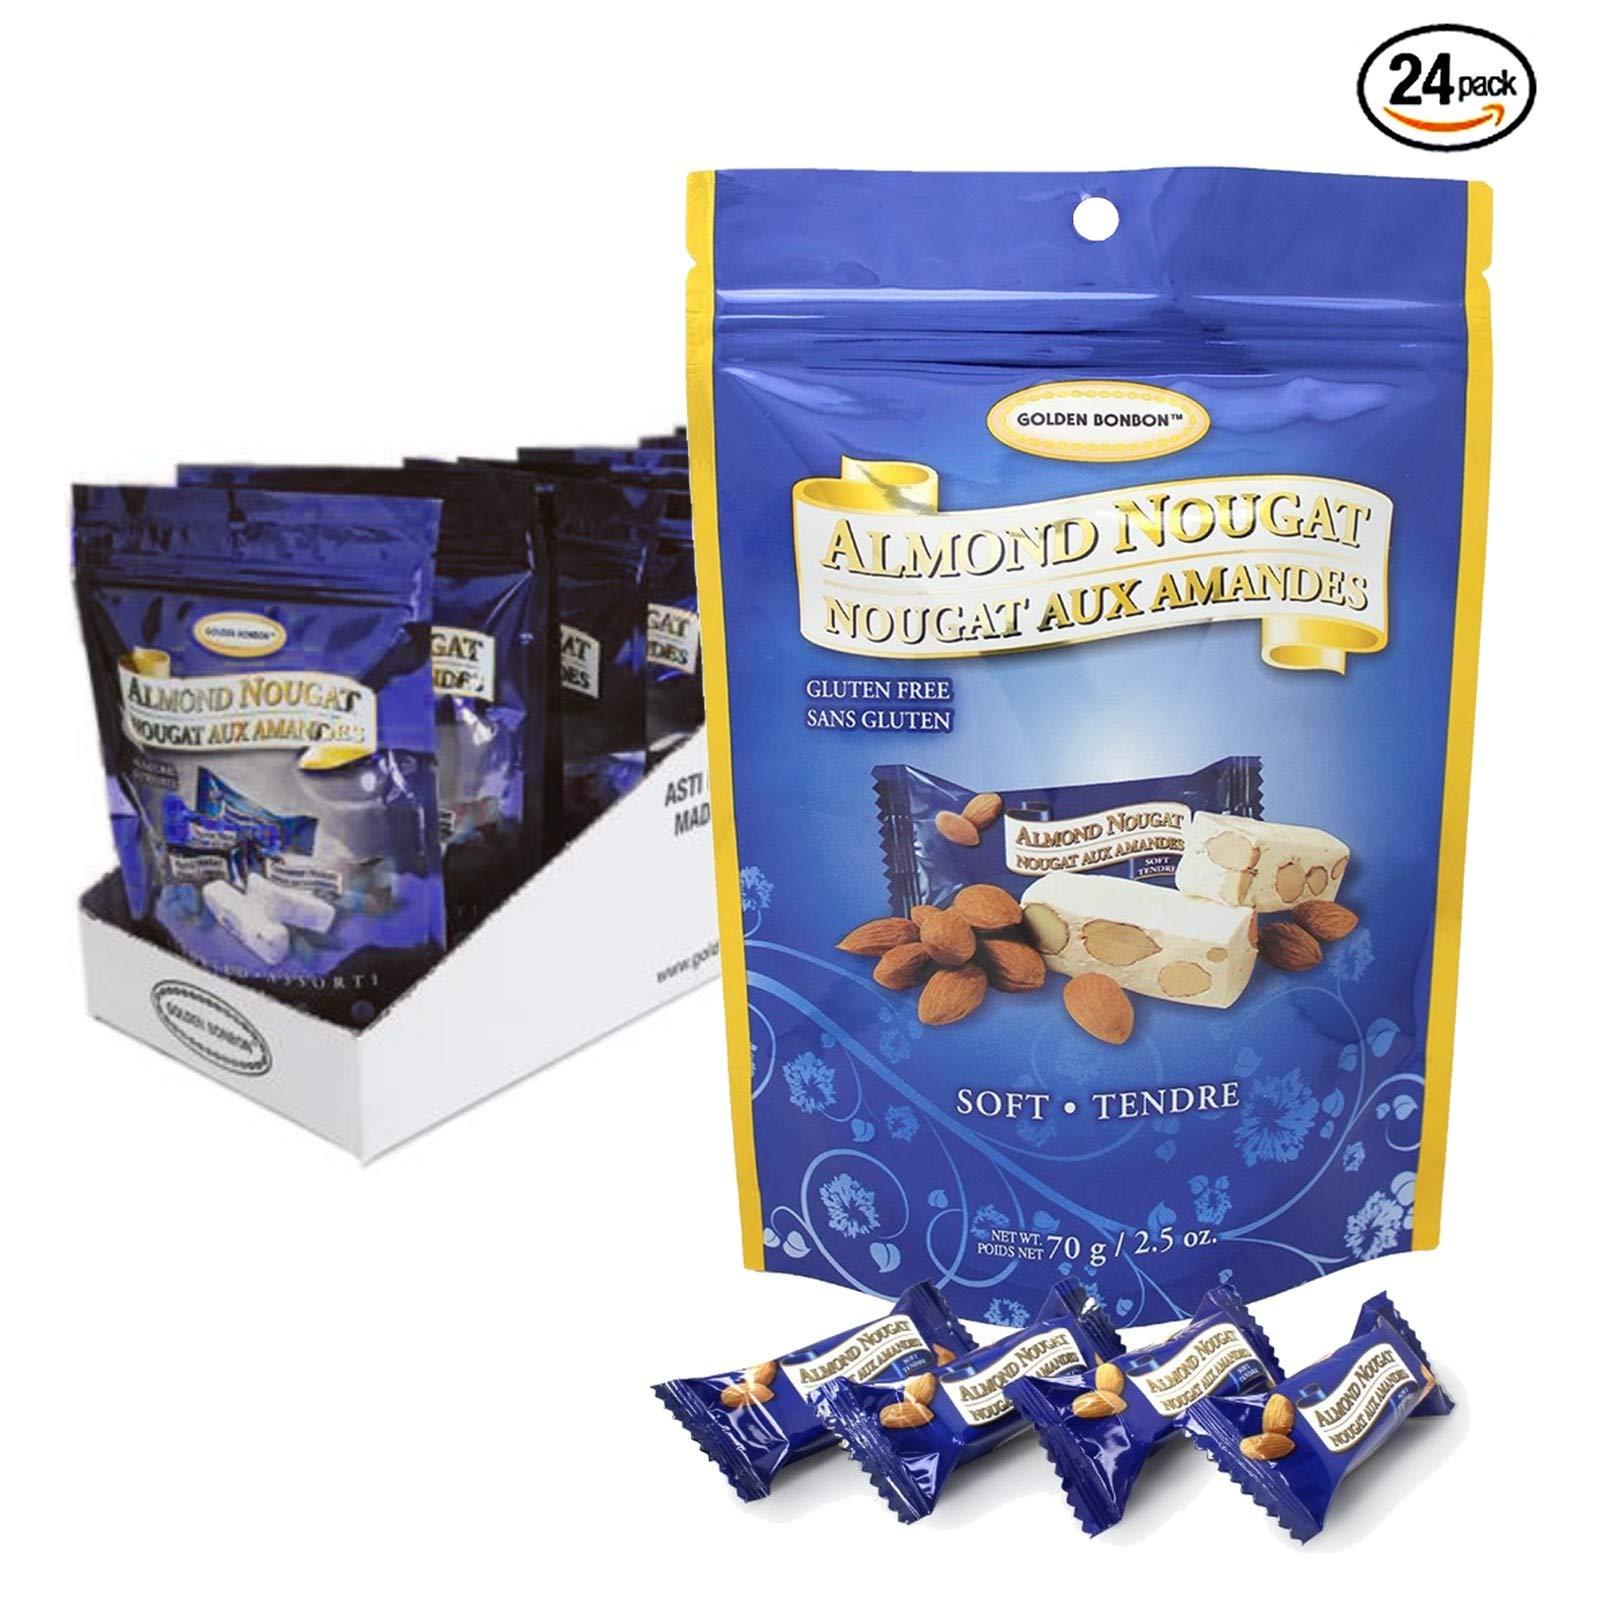 Golden Bonbon Gluten Free Almond Nougat Chewy Candy 2.5oz, 24 Packs (Original Soft)